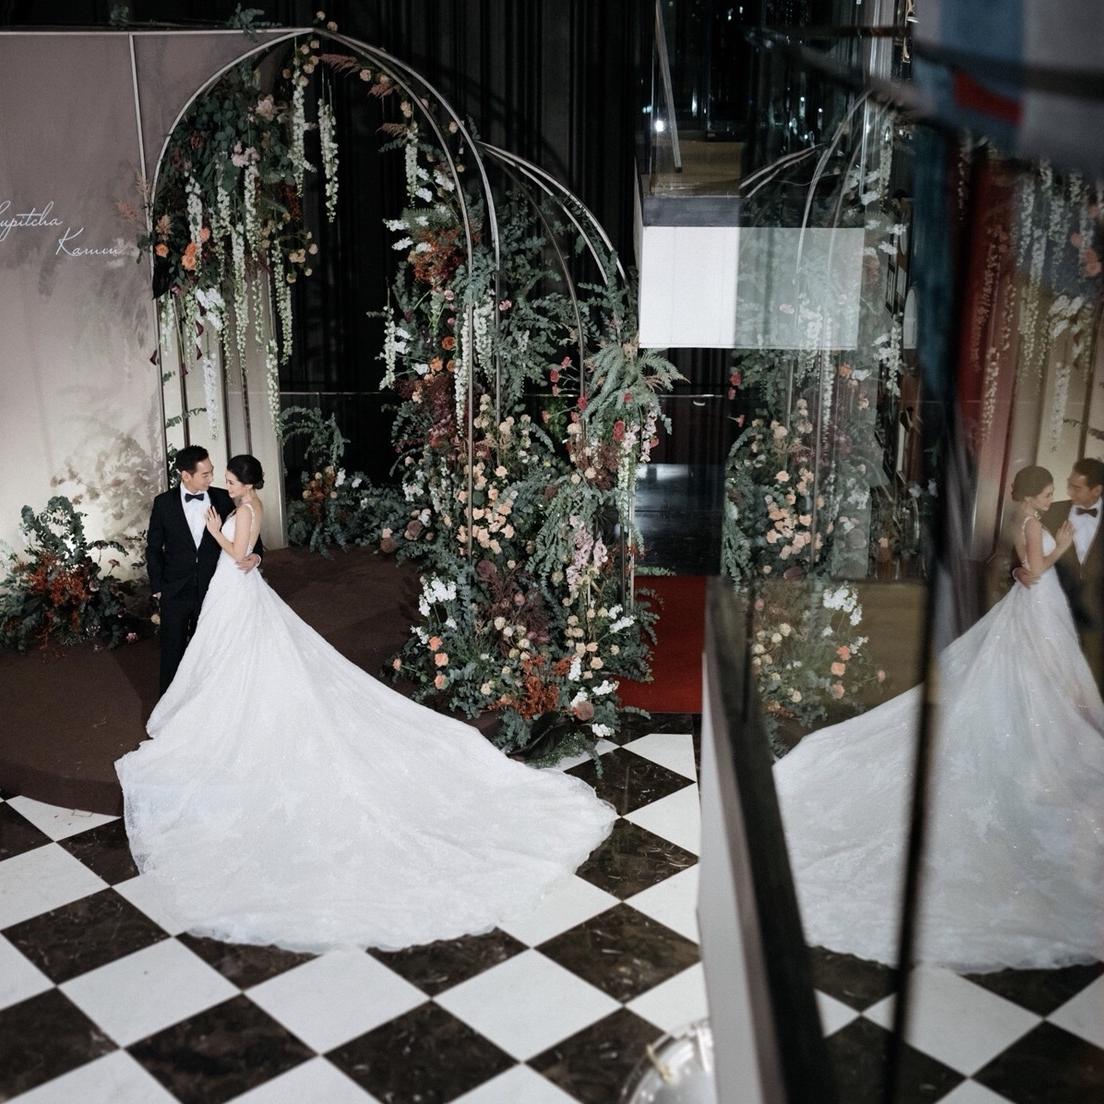 marry me at so wedding fair